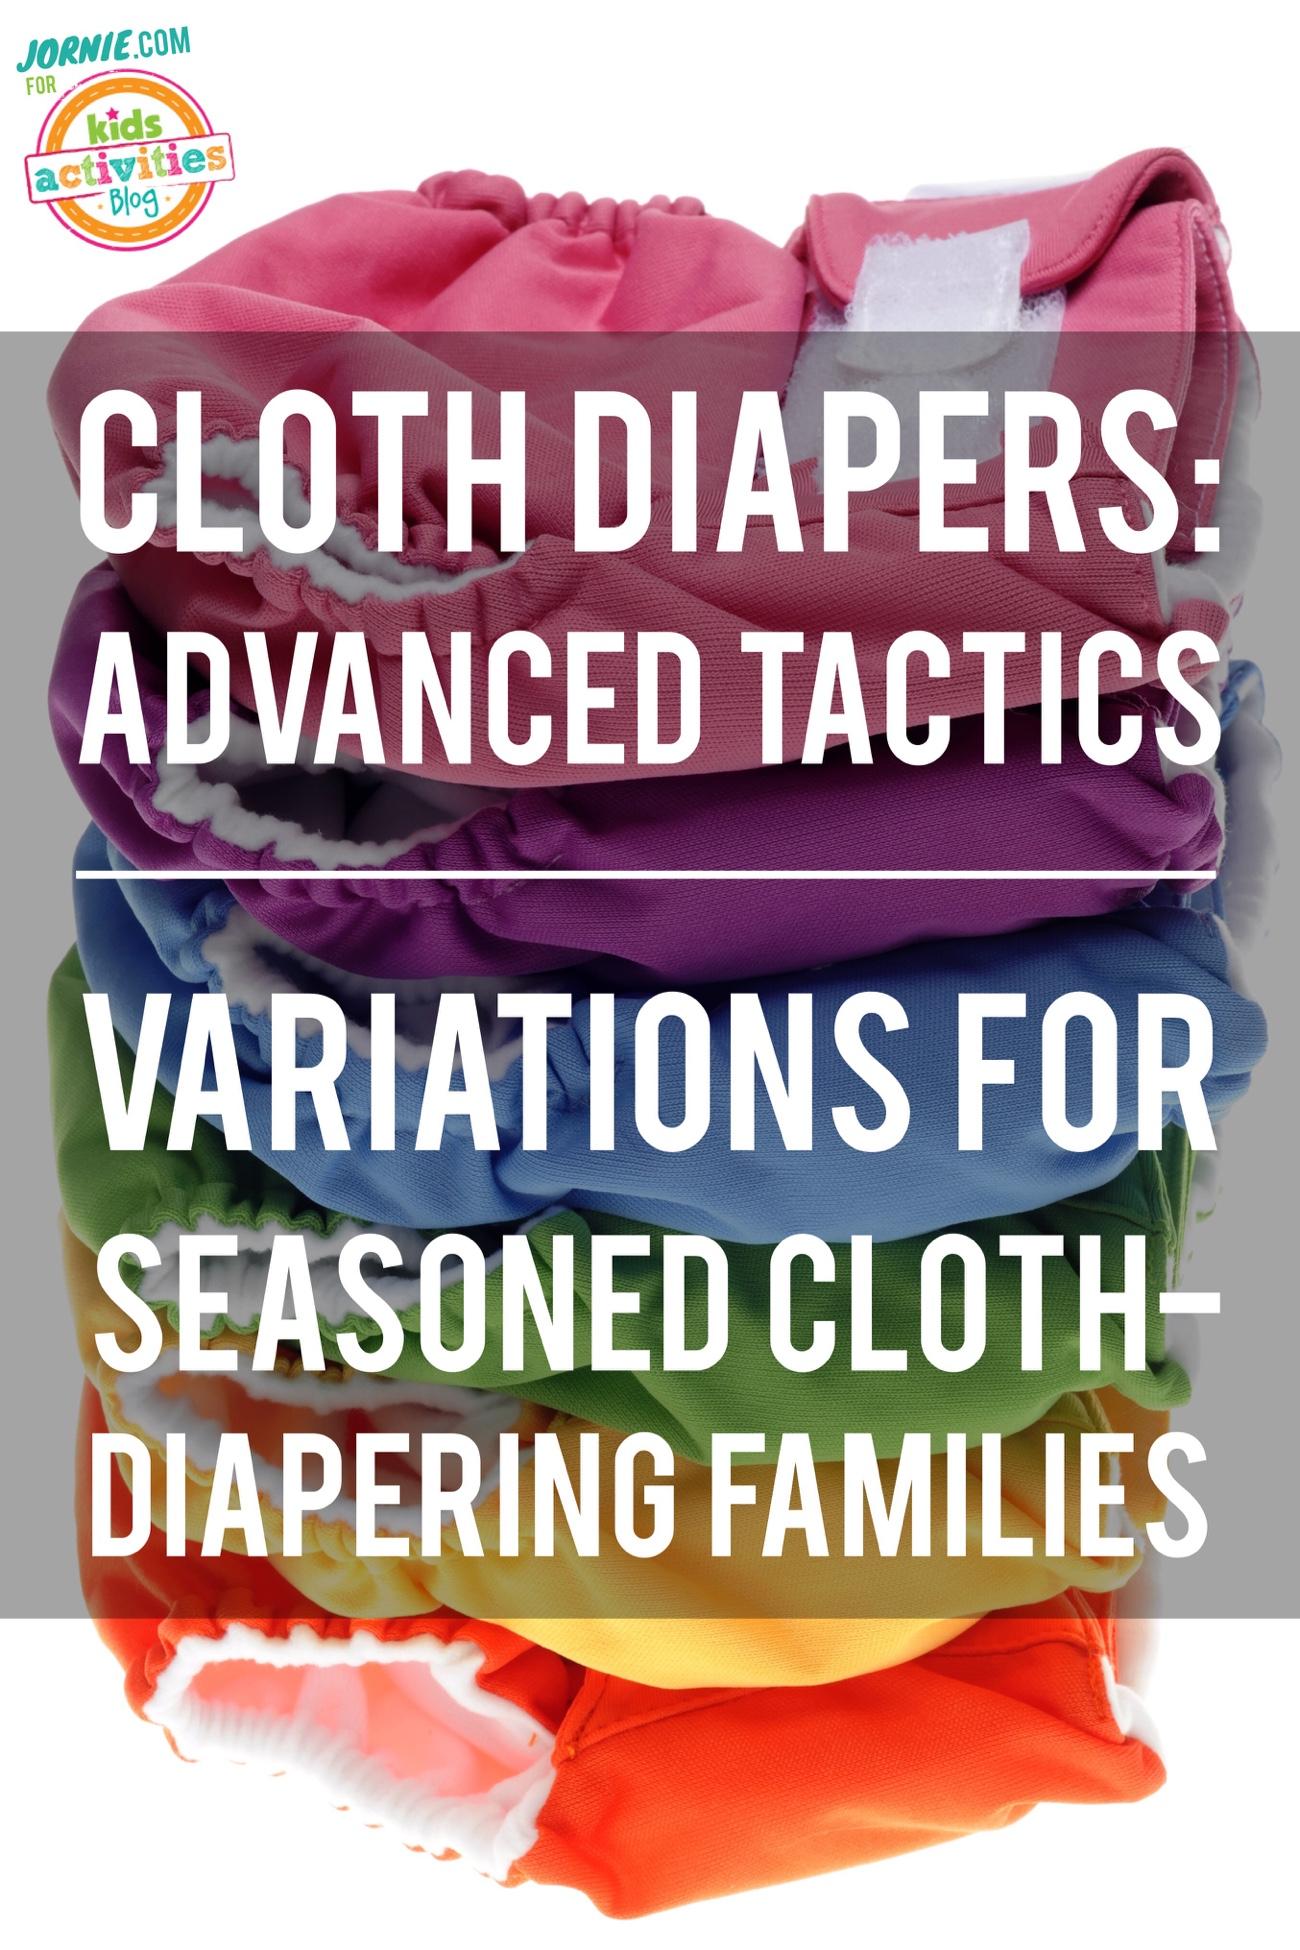 Cloth Diapers: Advanced Tactics - Variations for Seasoned Cloth-Diapering Families